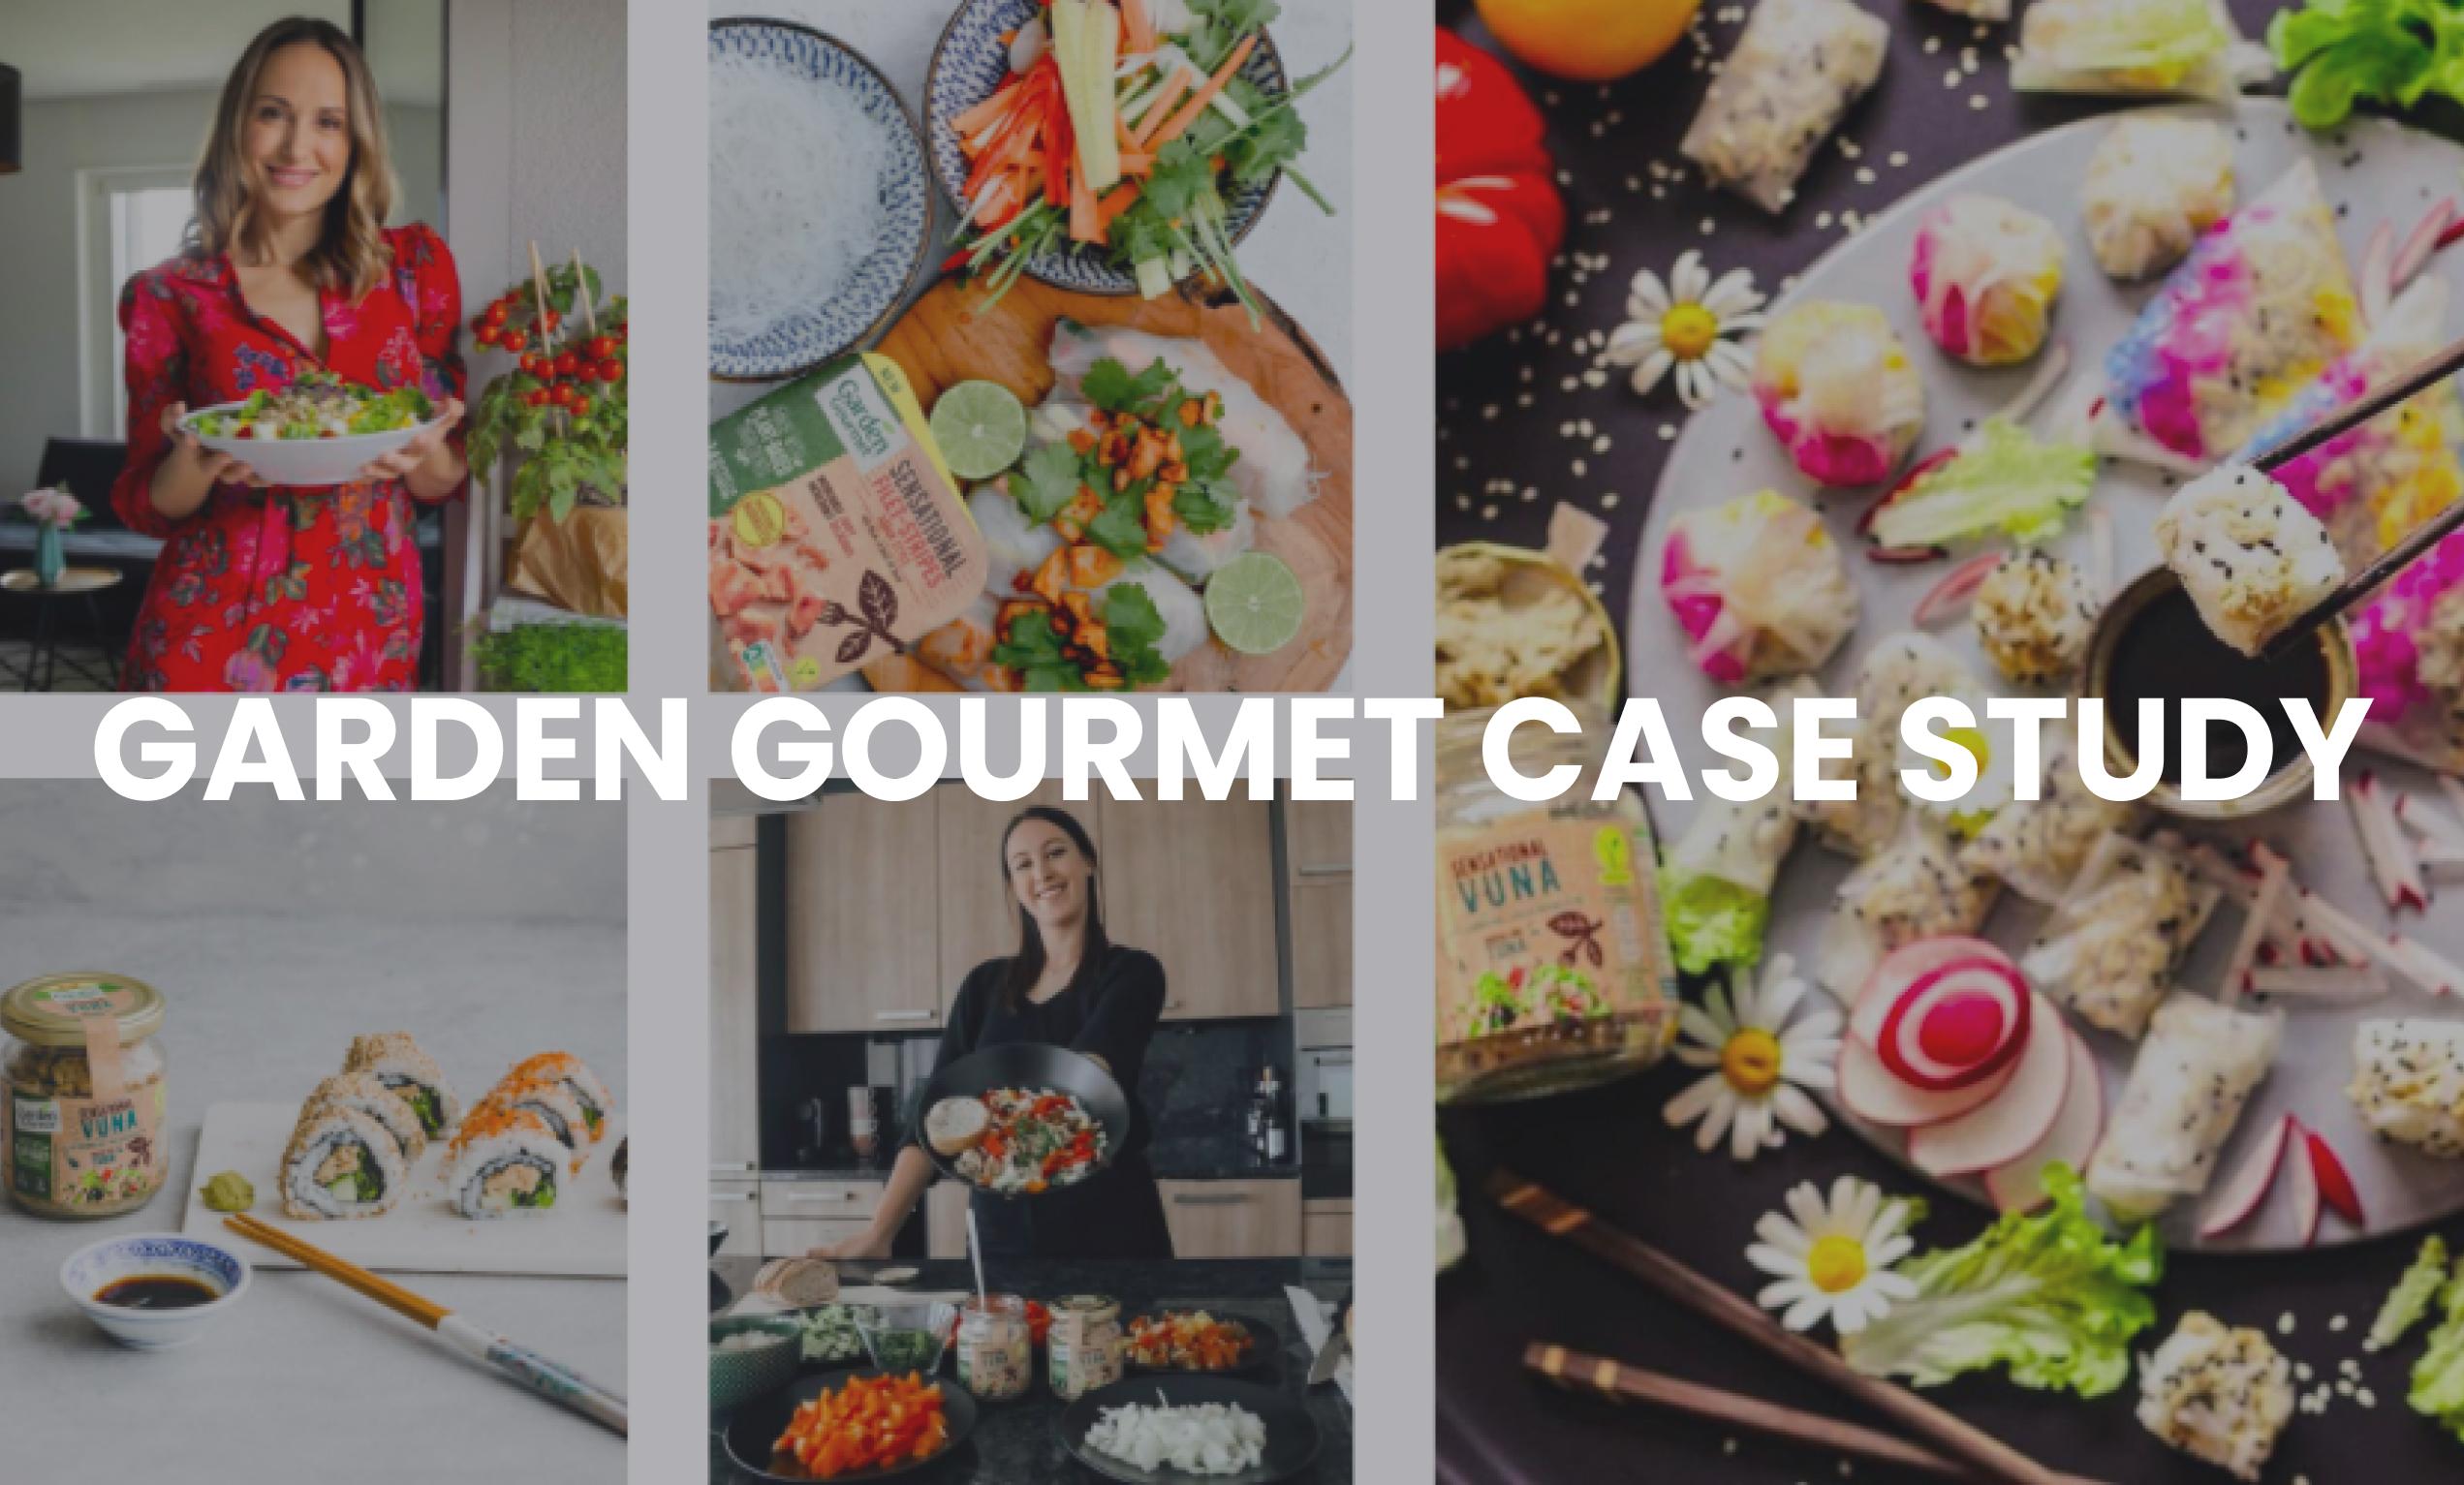 Garden Gourmet Case Study